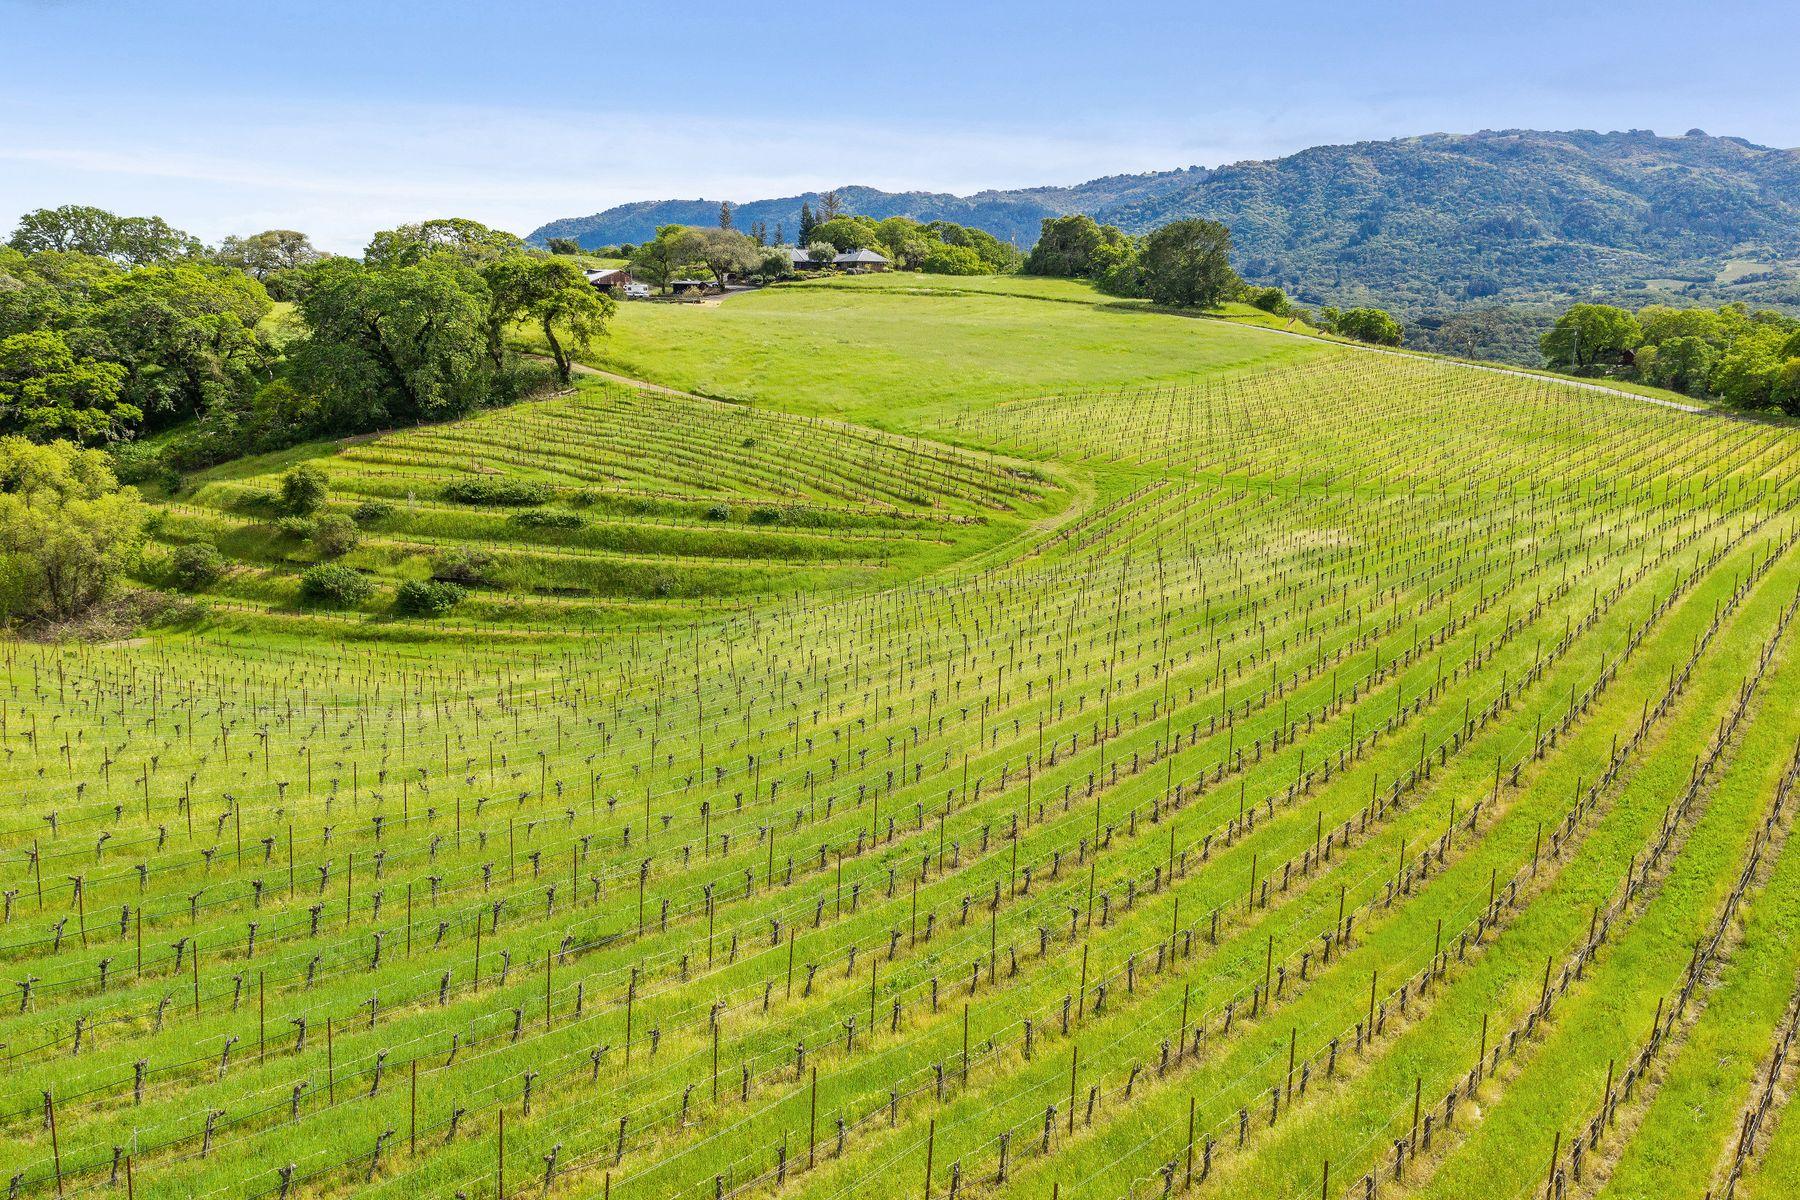 Vineyard Real Estate for Sale at Legacy Vineyard View Estate Glen Ellen, California 95442 United States